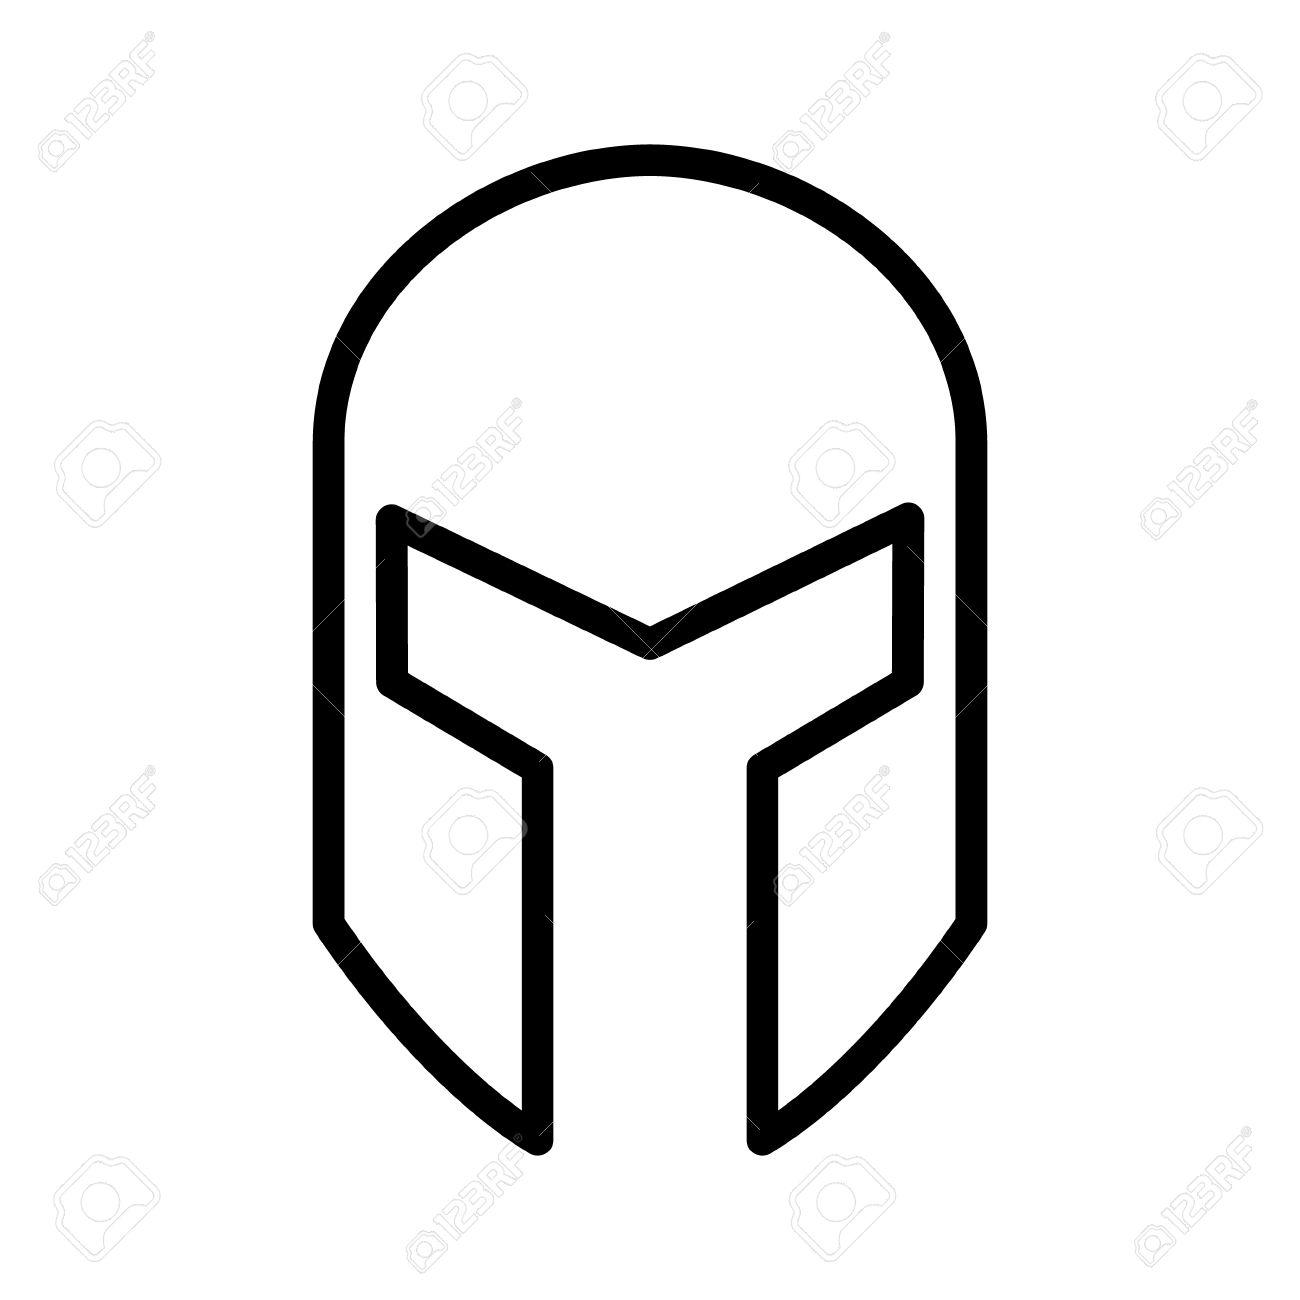 Medieval Gladiatorial Helmet Headgear Line Art Icon For Games.